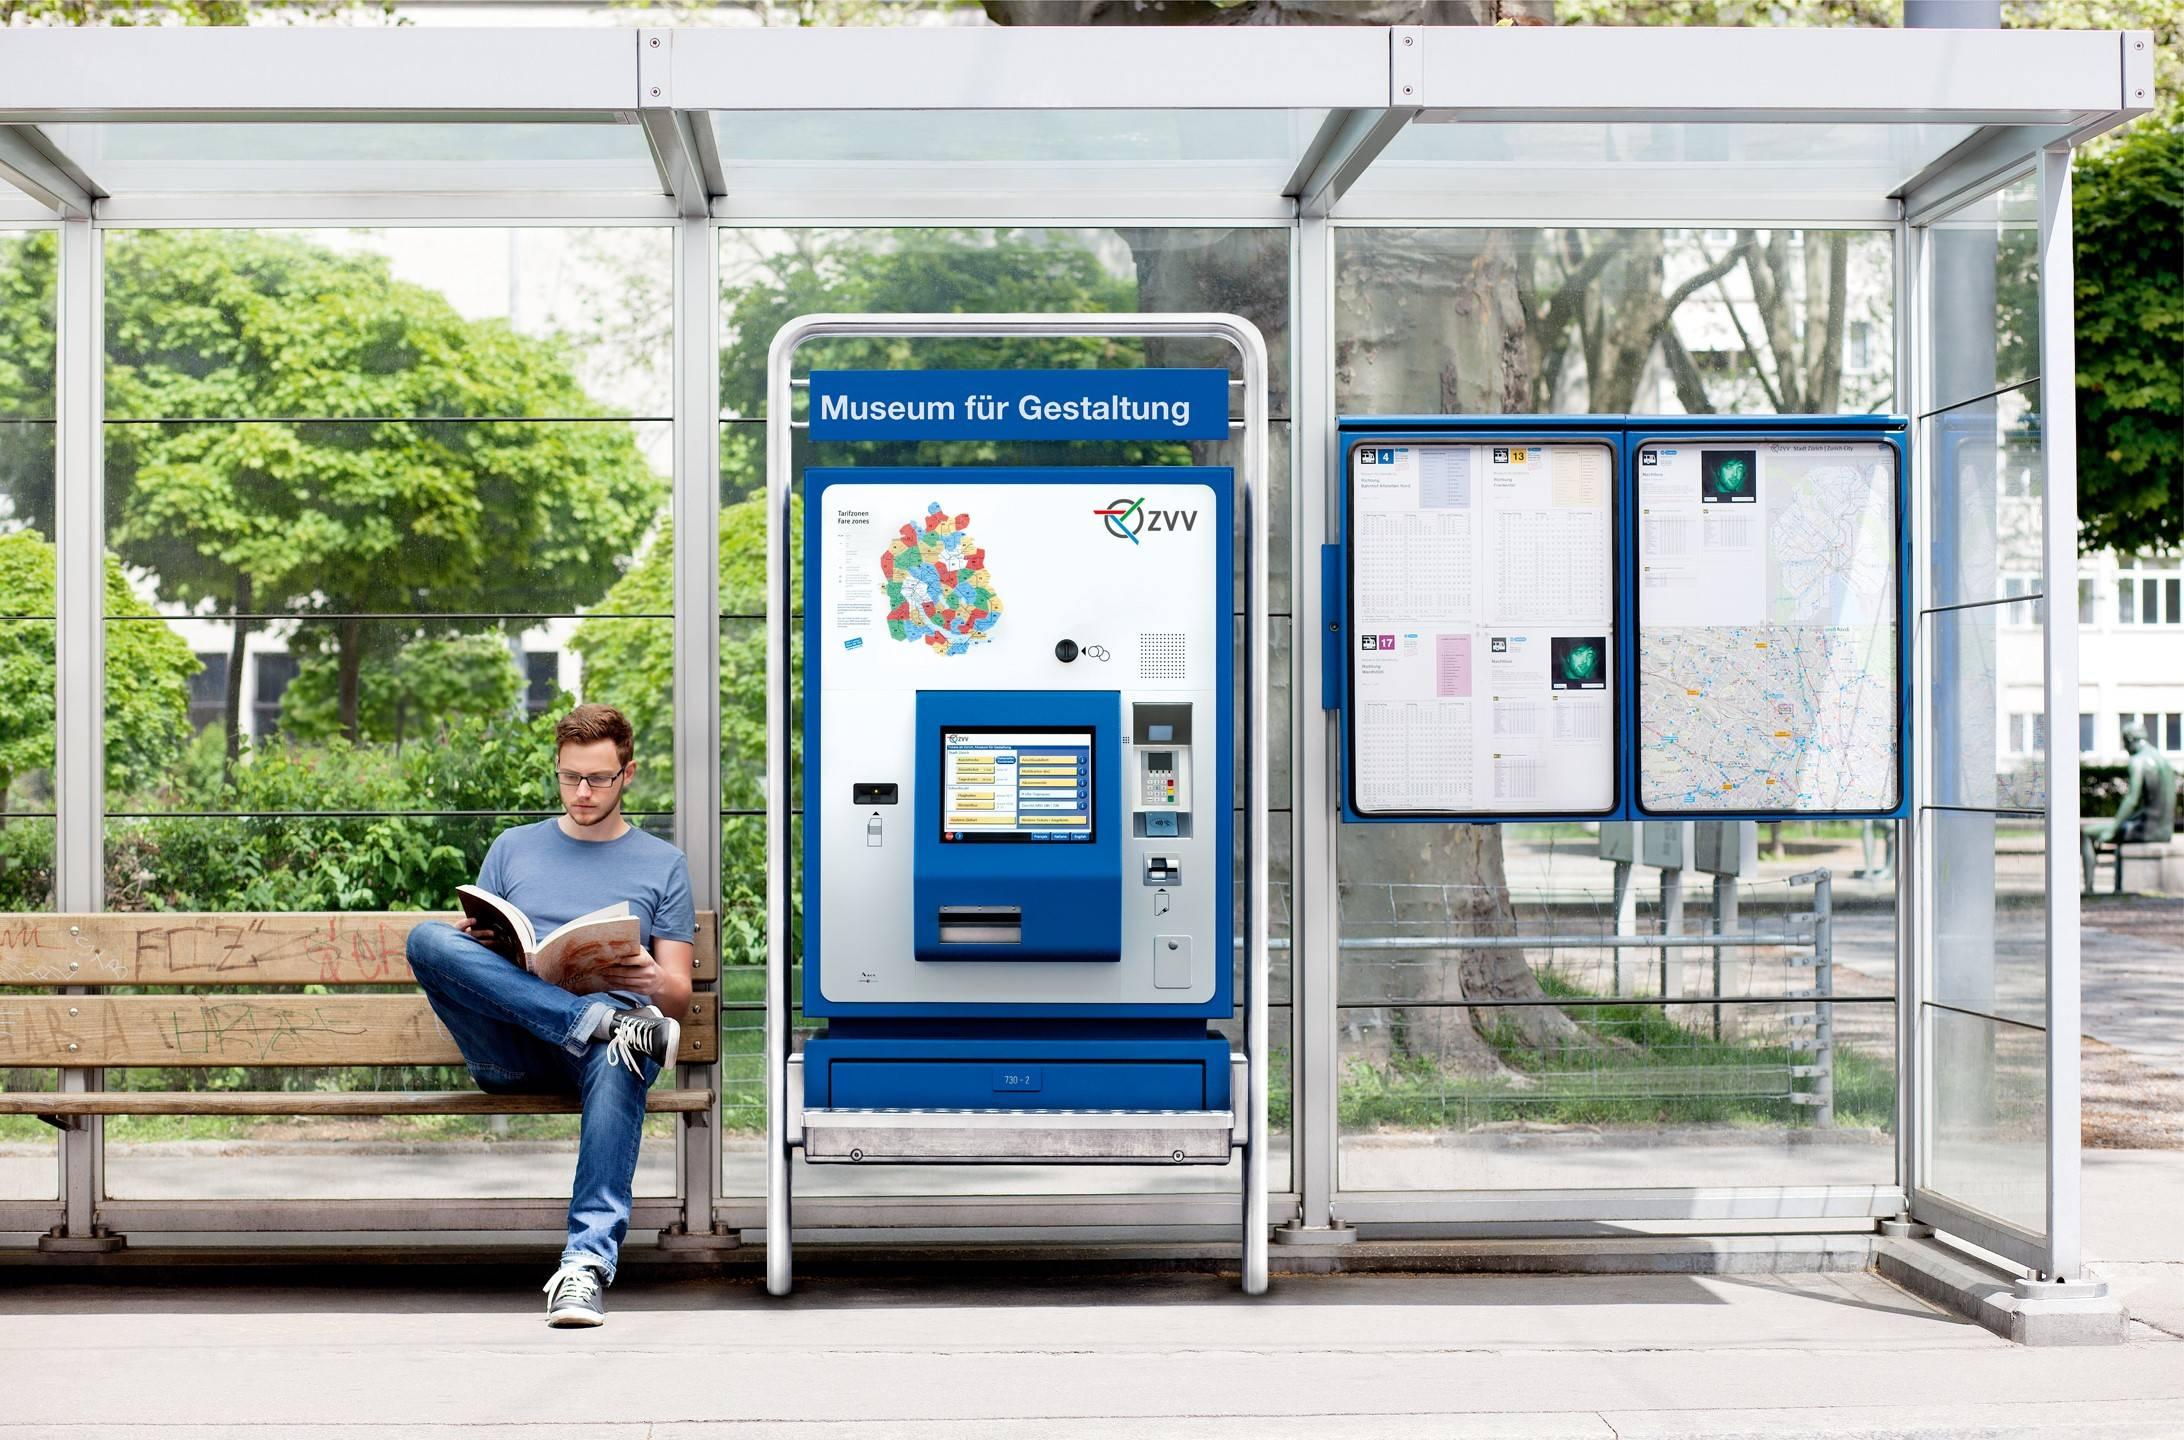 intro_course/img/ticketautomat.jpg